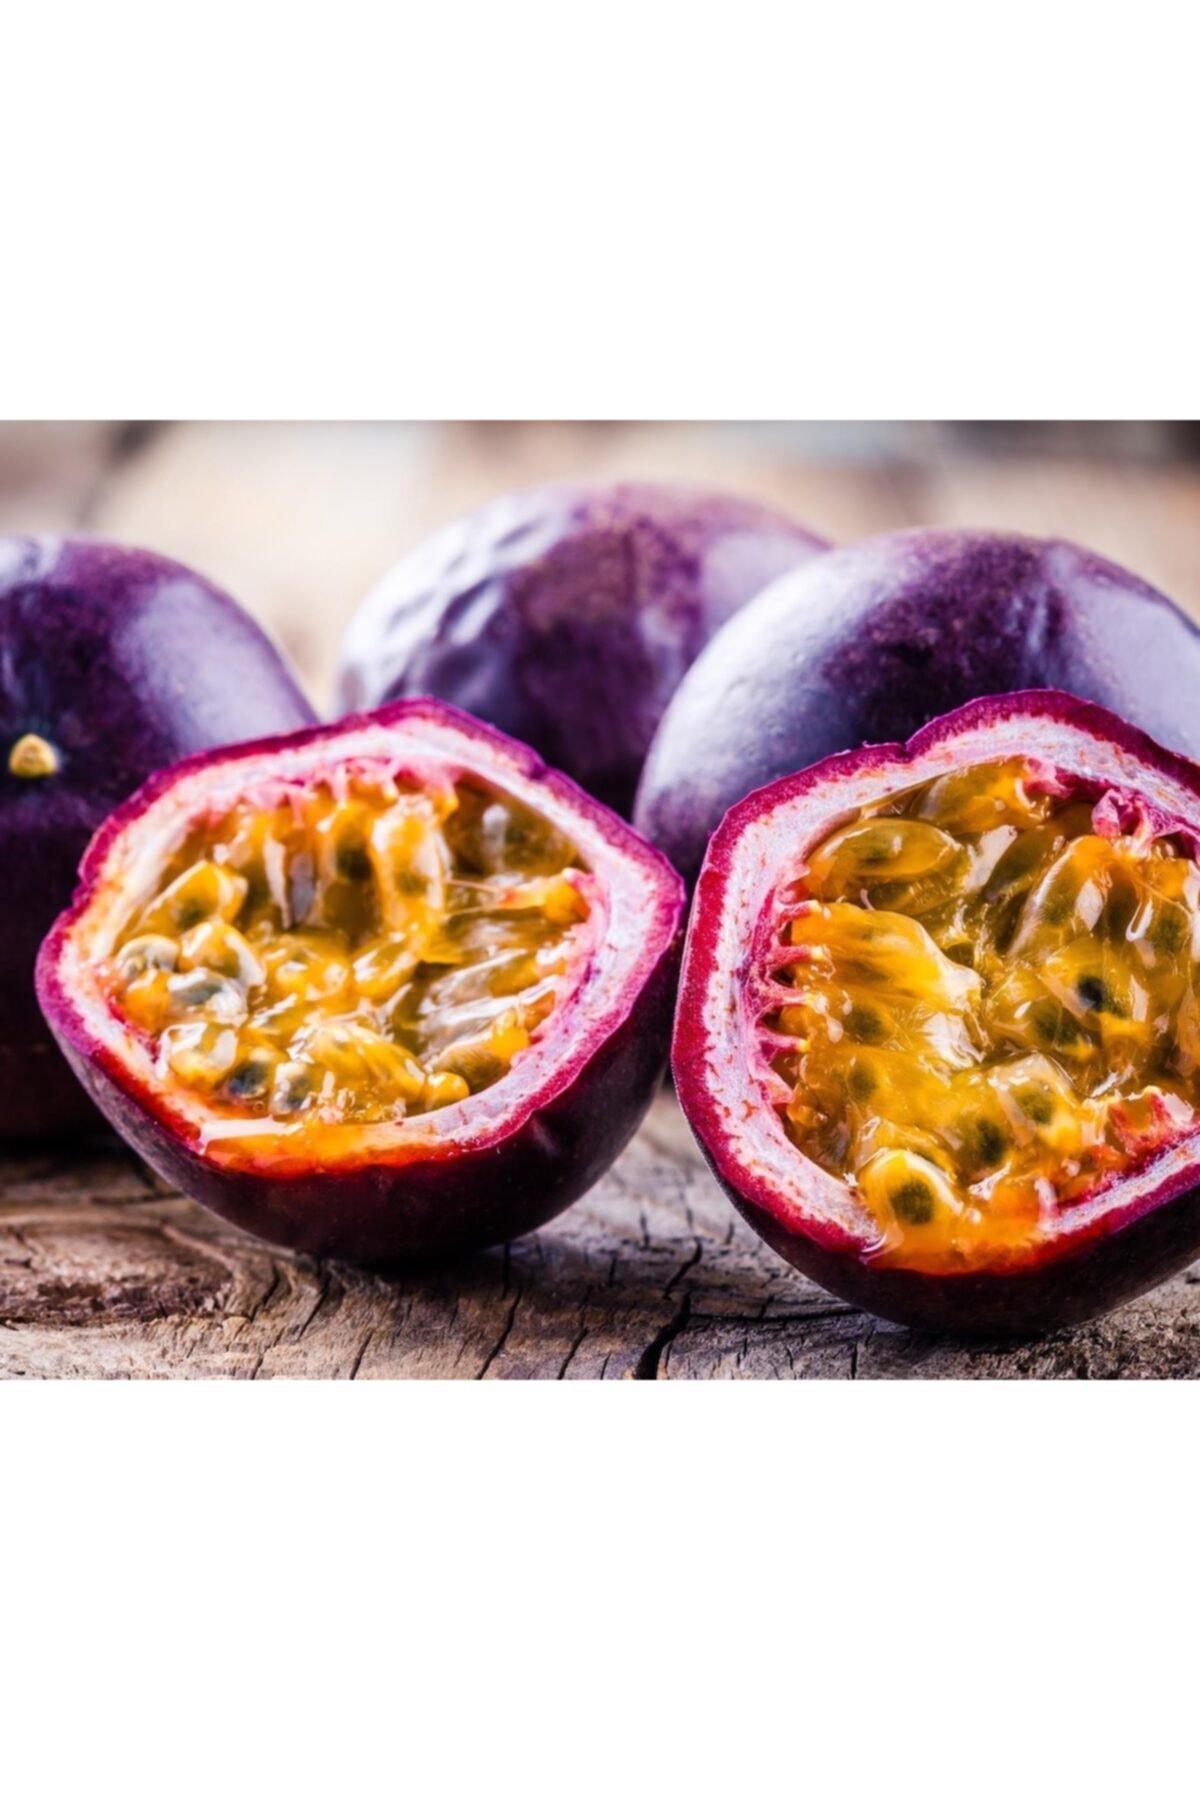 TROPİK SEPETİ Çarkıfelek (pasiflora) Meyvesi - 2 Adet 2